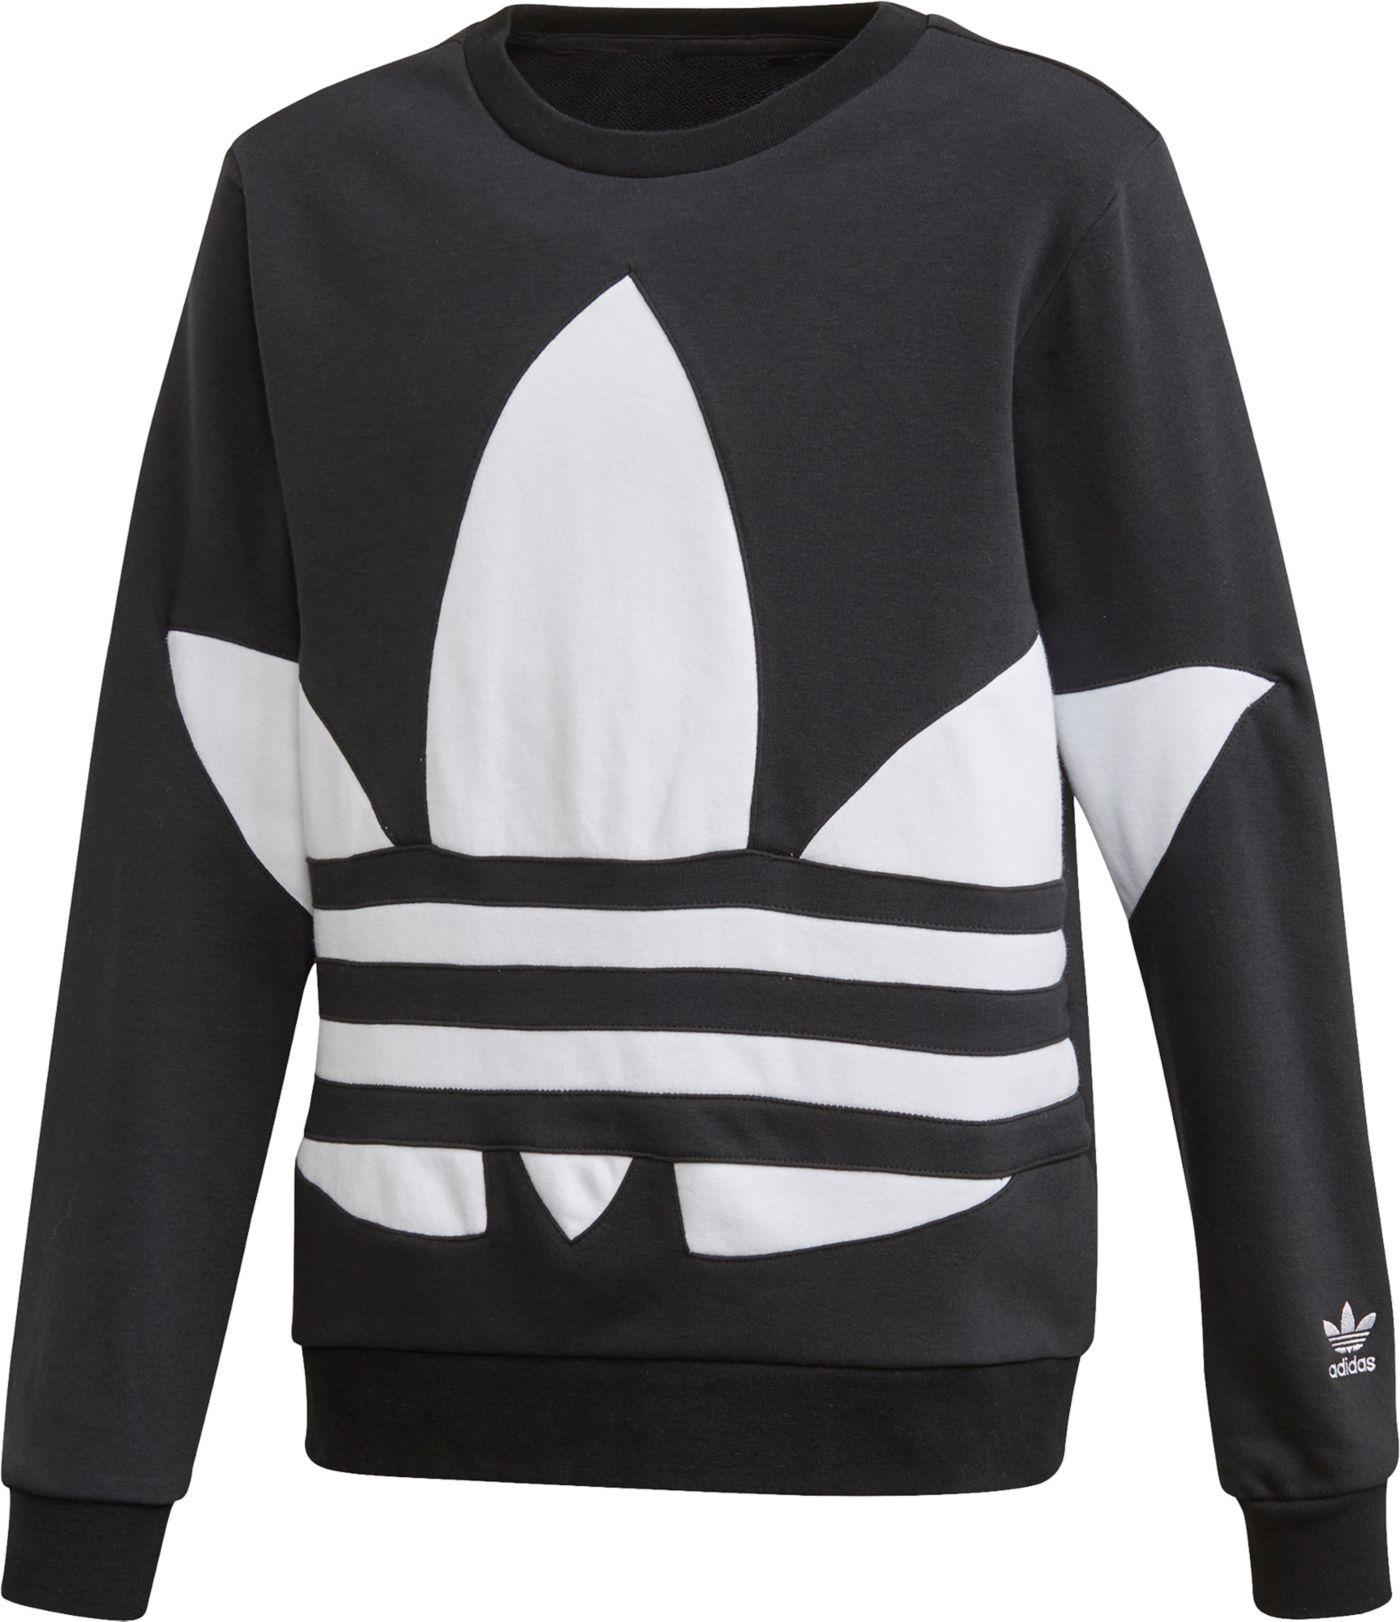 adidas Originals Boys' Big Trefoil Crew Sweatshirt